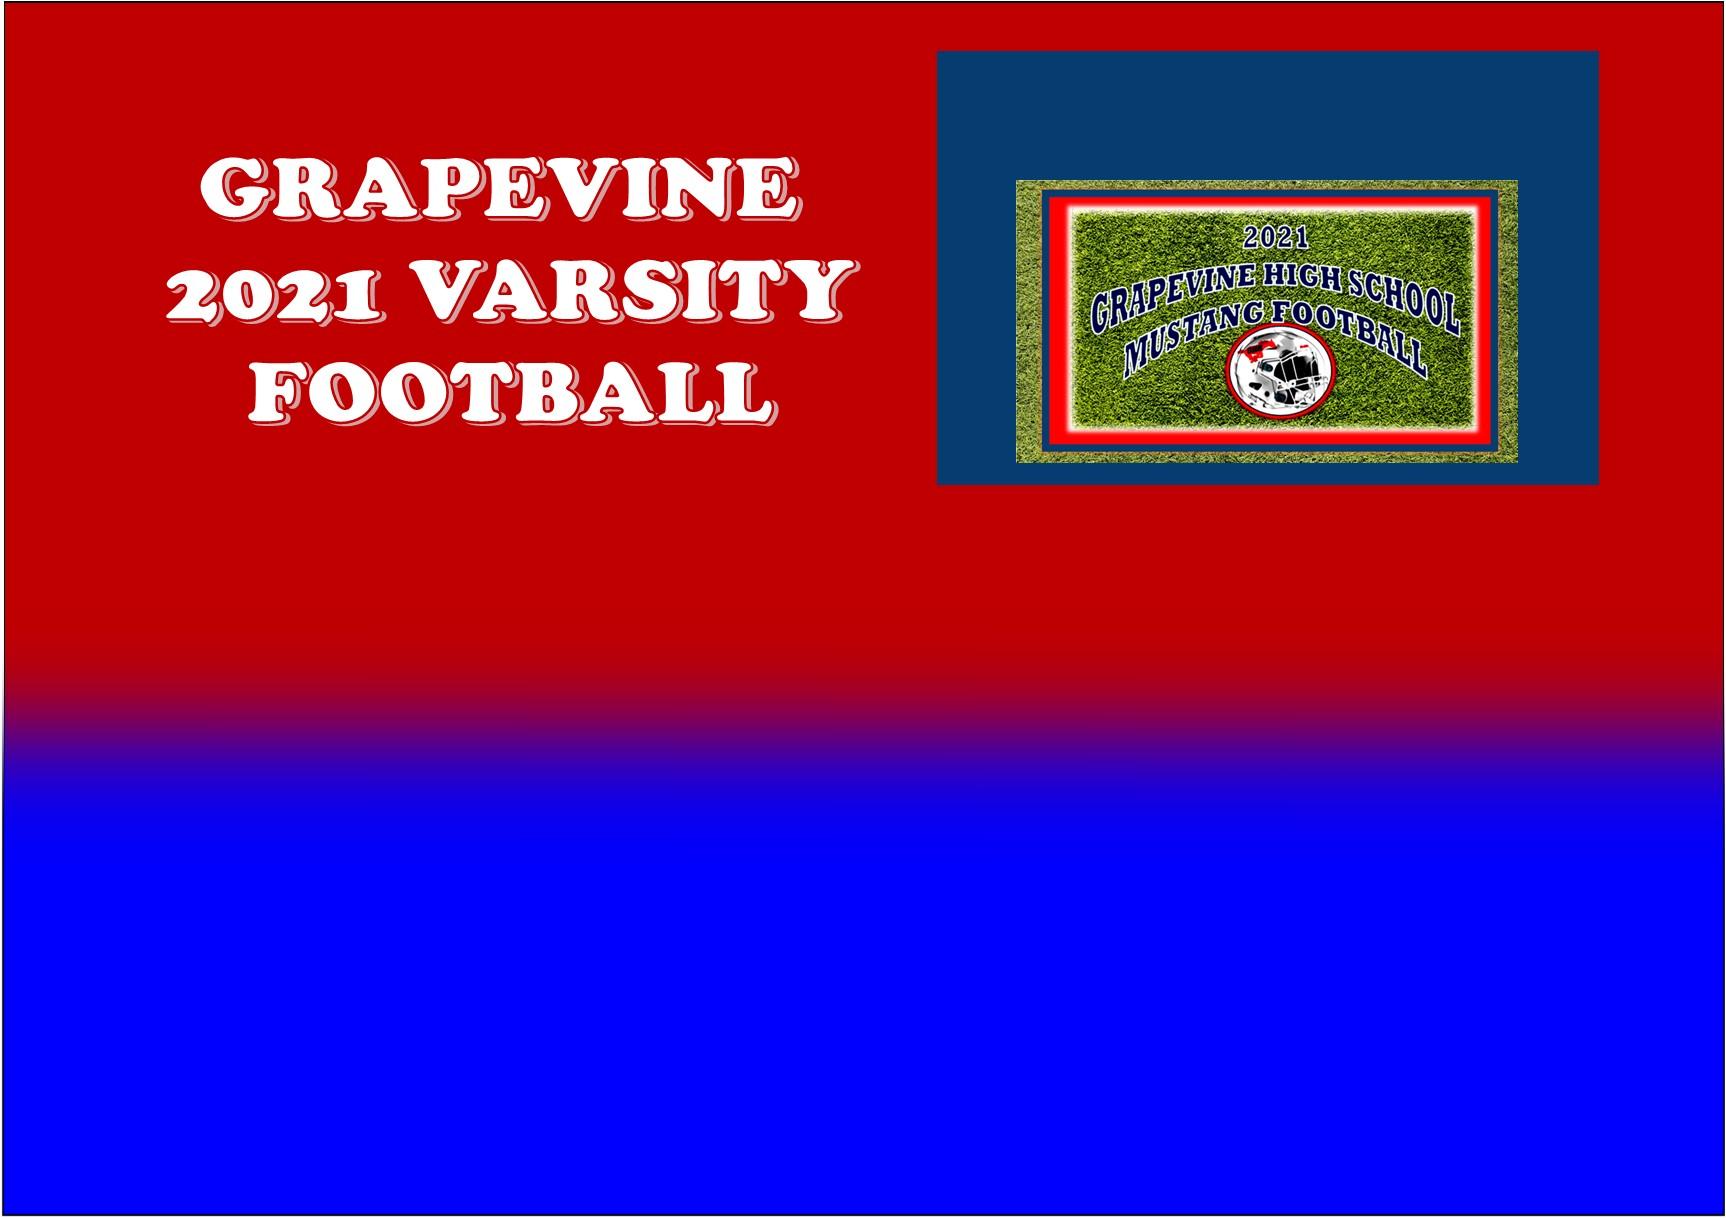 GCISD Football: Grapevine Mustangs Announce 2021 Varsity Football Schedule